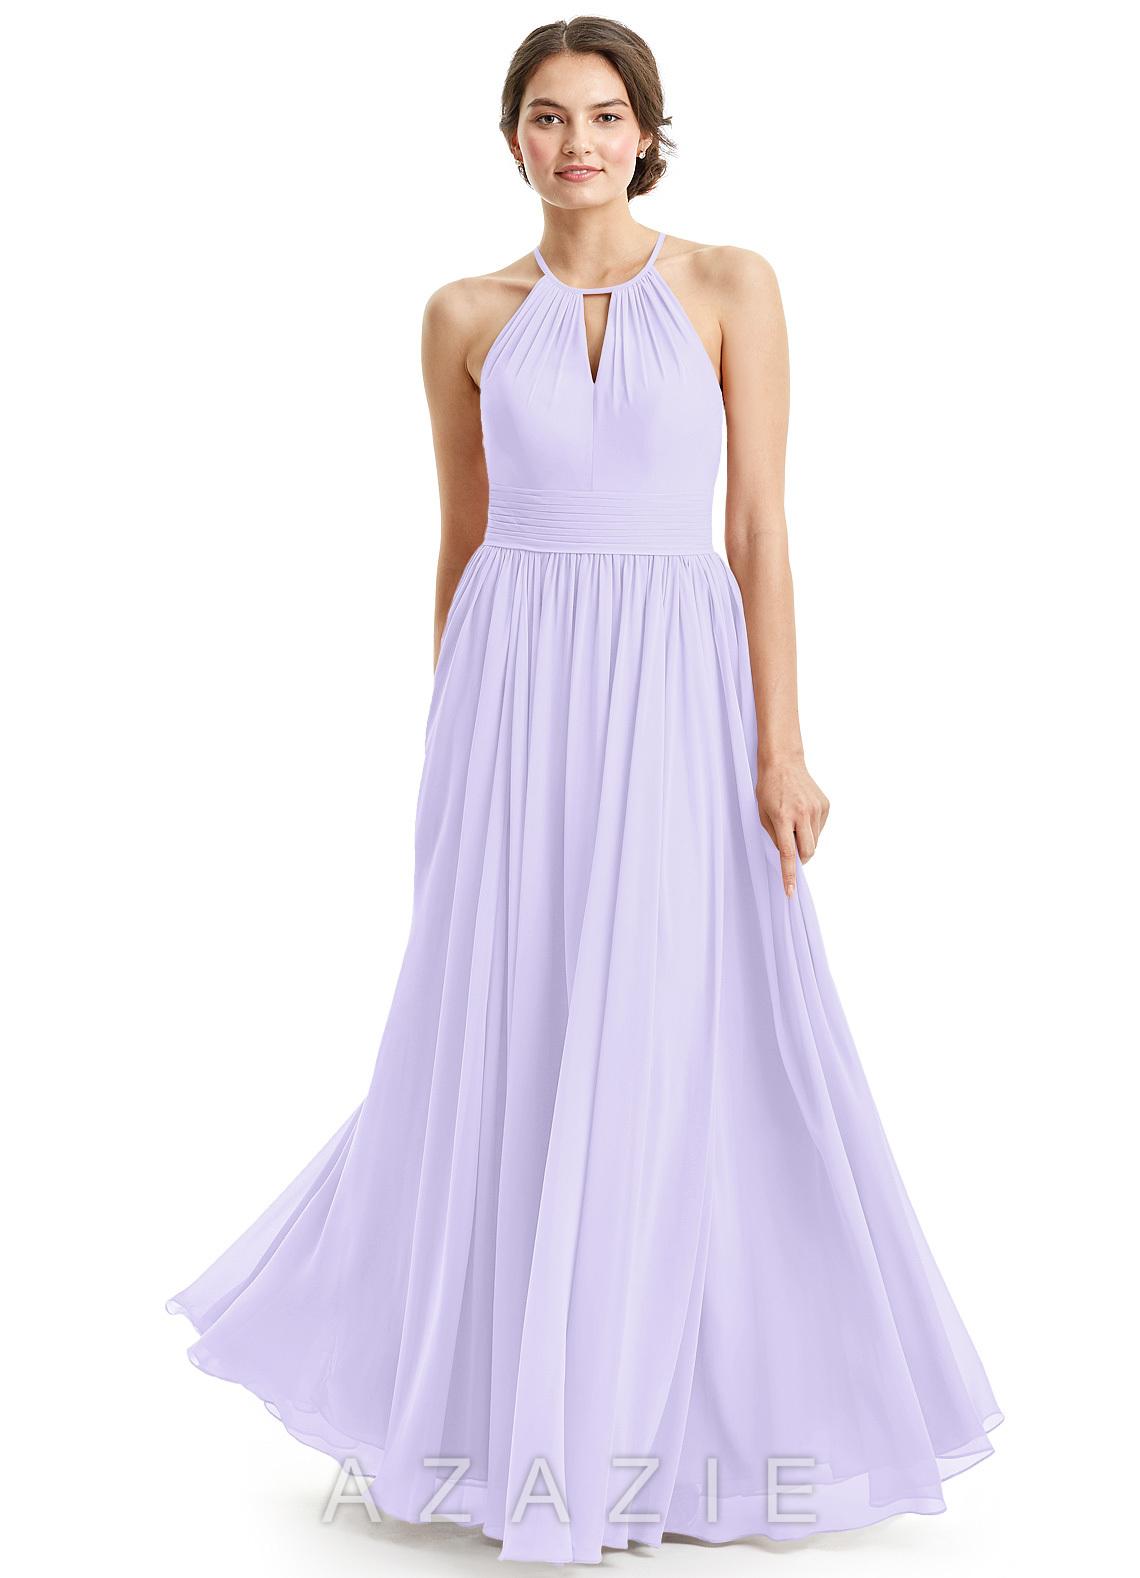 Azazie cherish bridesmaid dress azazie home bridesmaid dresses azazie cherish azazie cherish ombrellifo Image collections